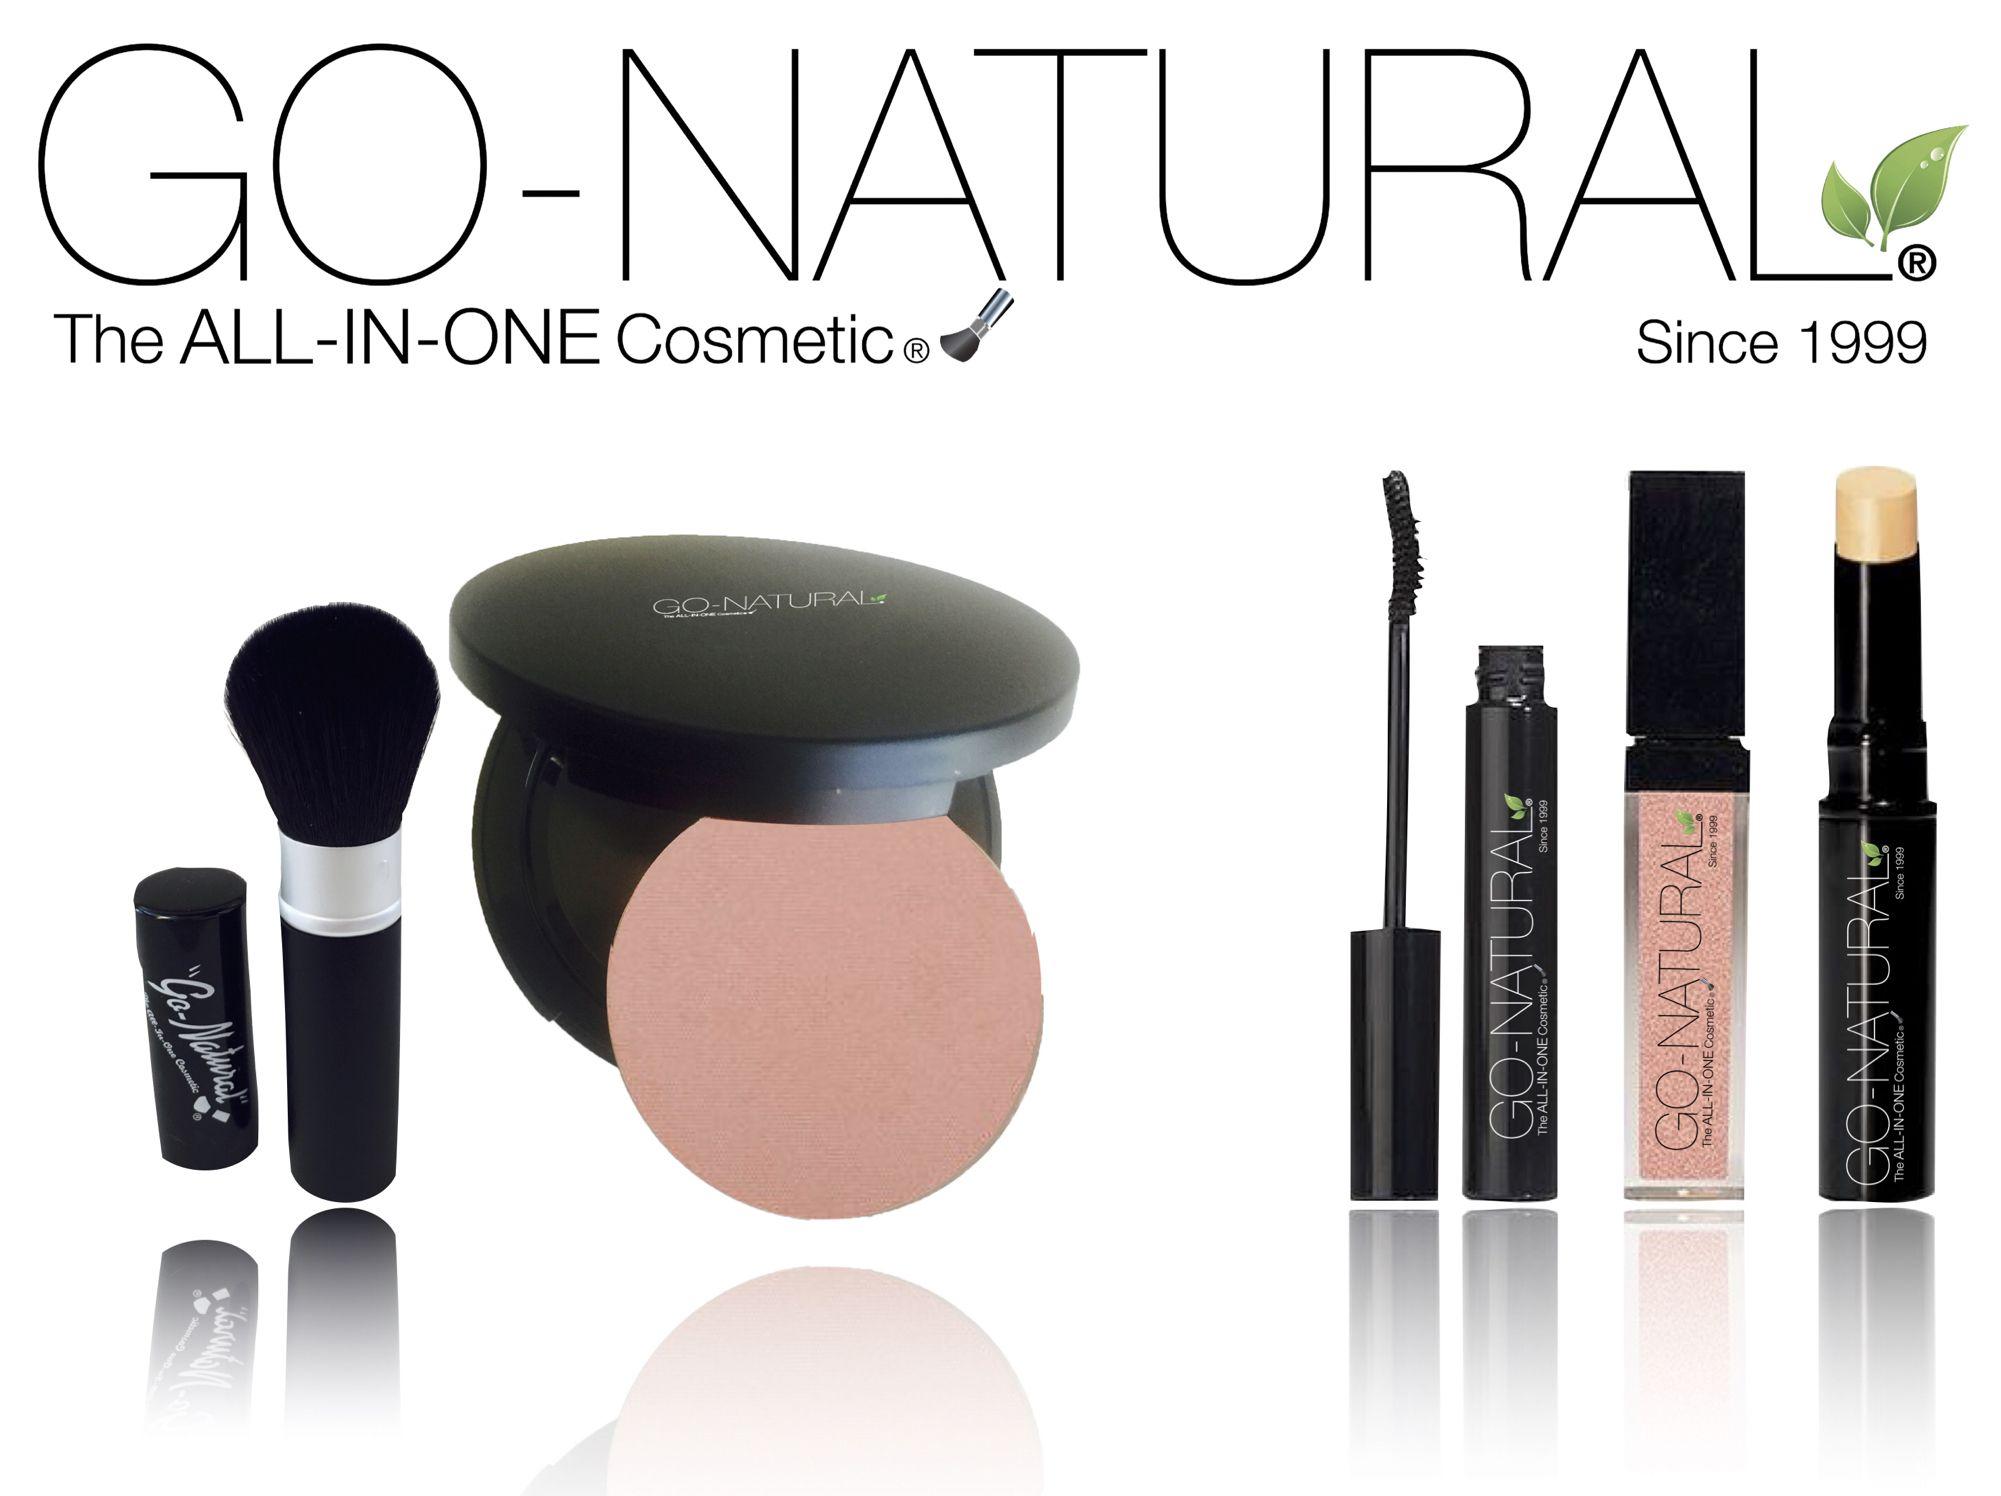 City of Toronto Going natural, Cosmetic shop, Makeup